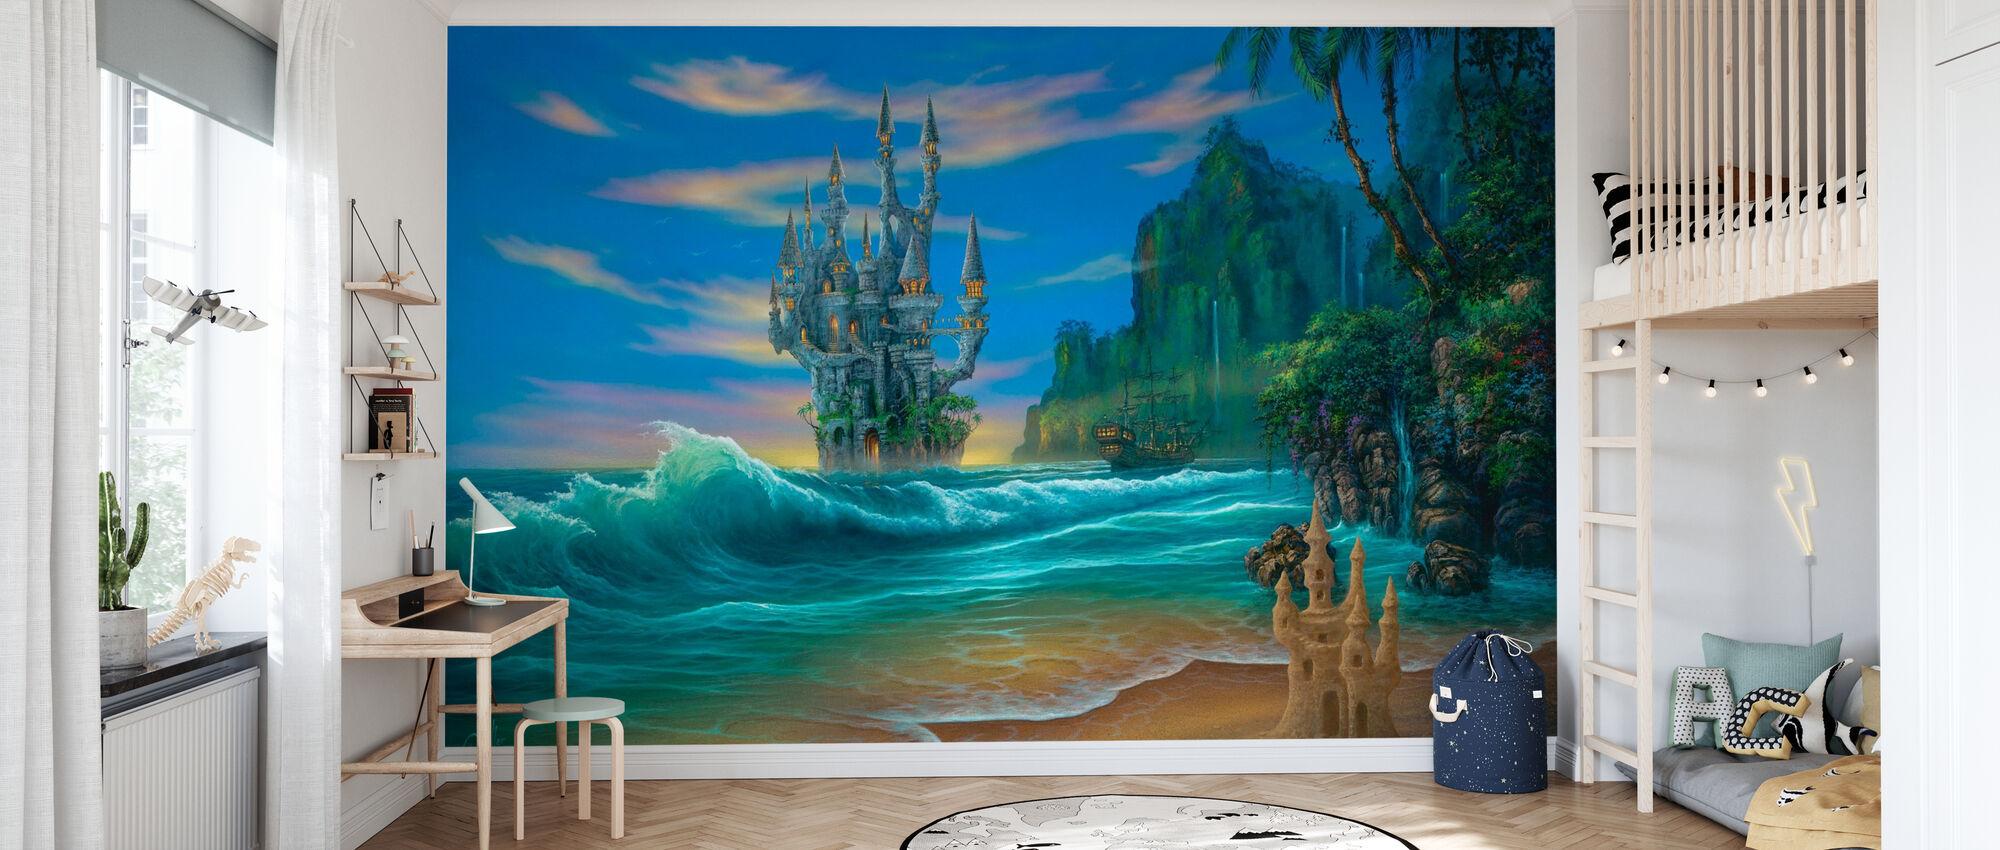 Fantasy Beach - Wallpaper - Kids Room